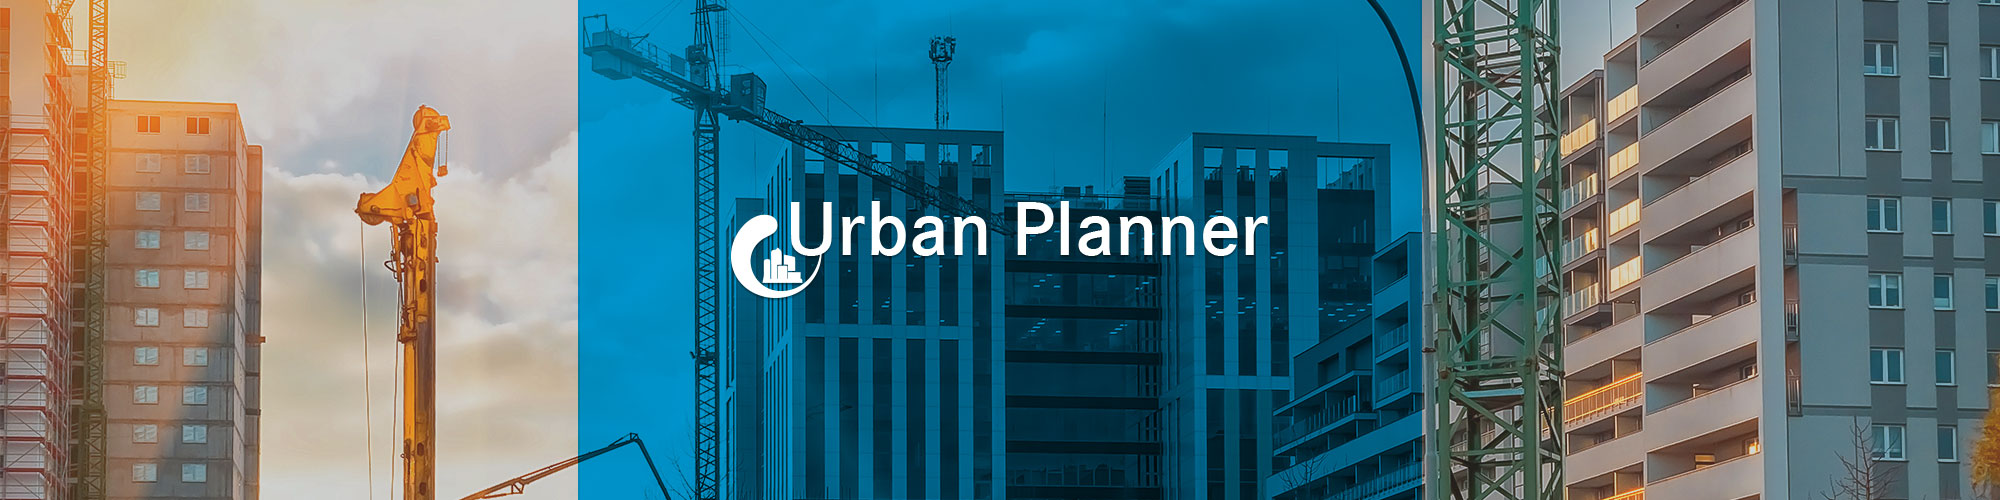 Ingeea Urban Planner